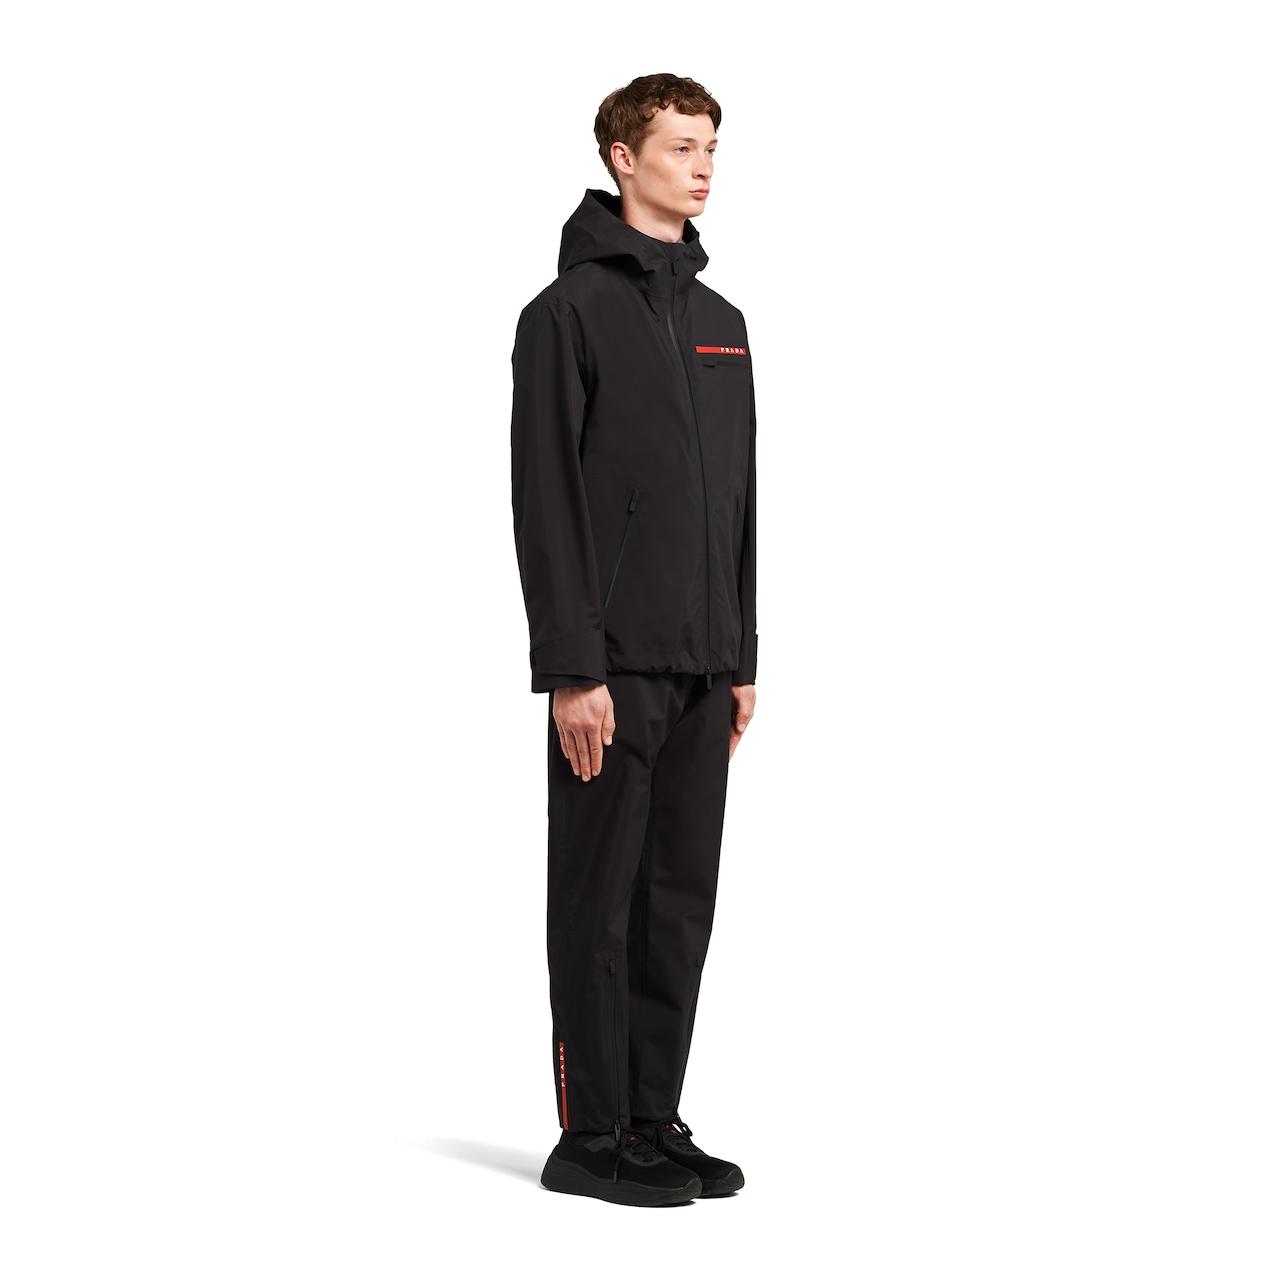 LR-MX002-MK2 technical fabric jacket